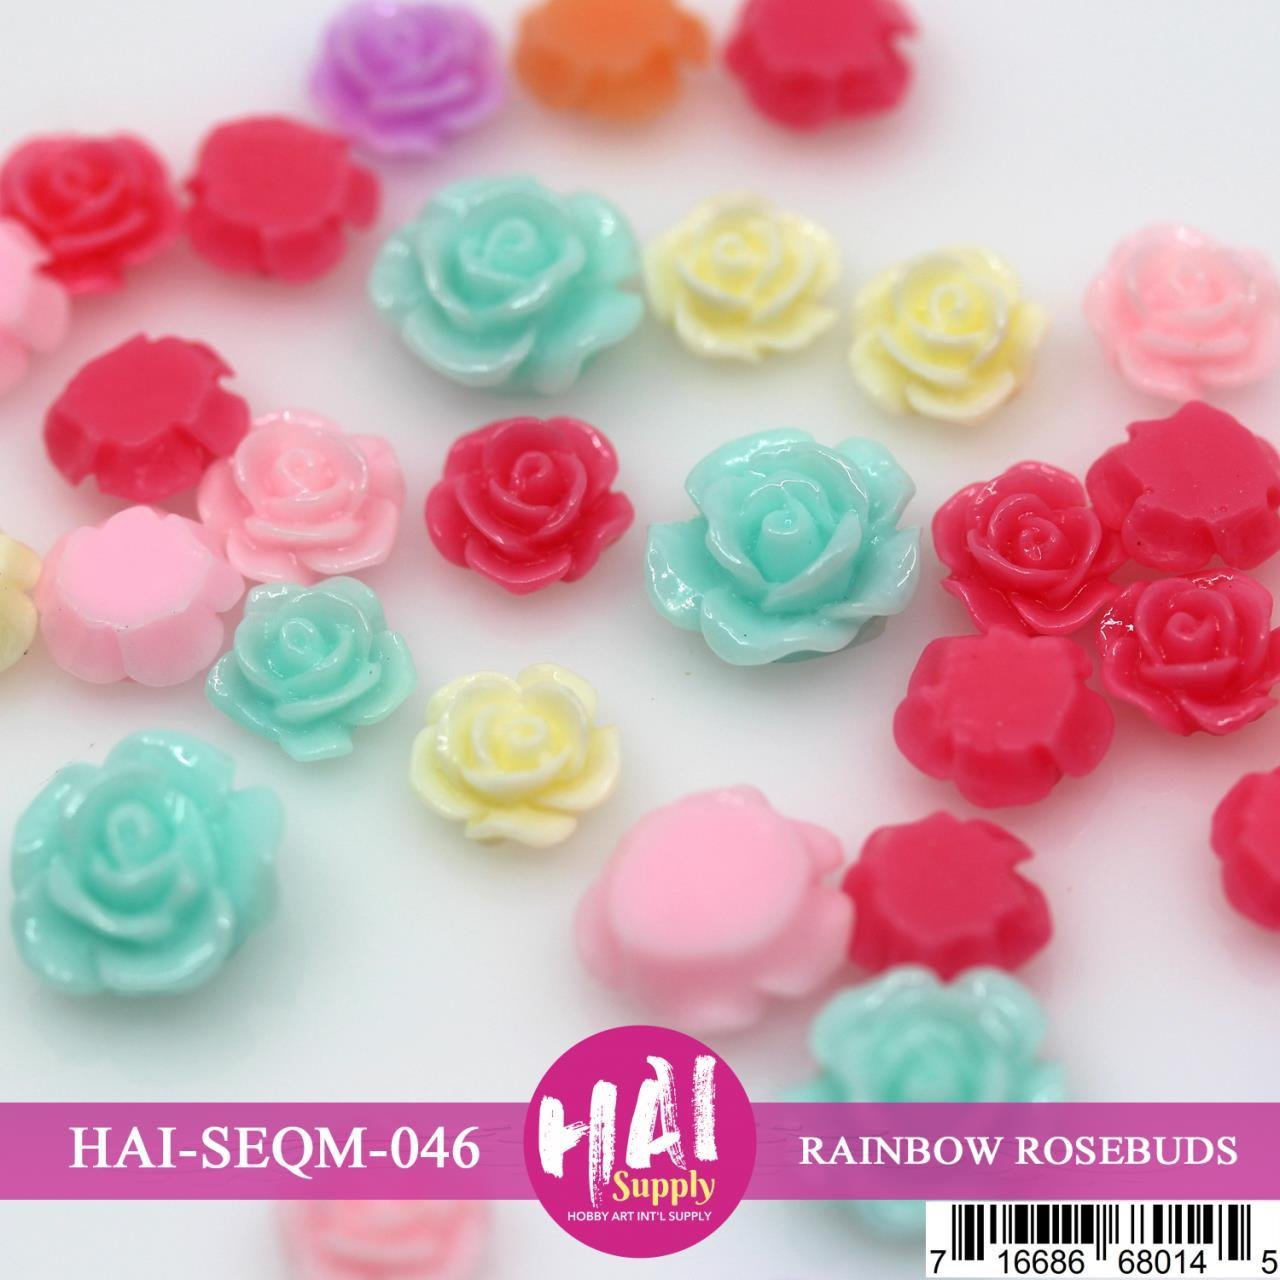 HAI Confetti - Rainbow Rosebuds